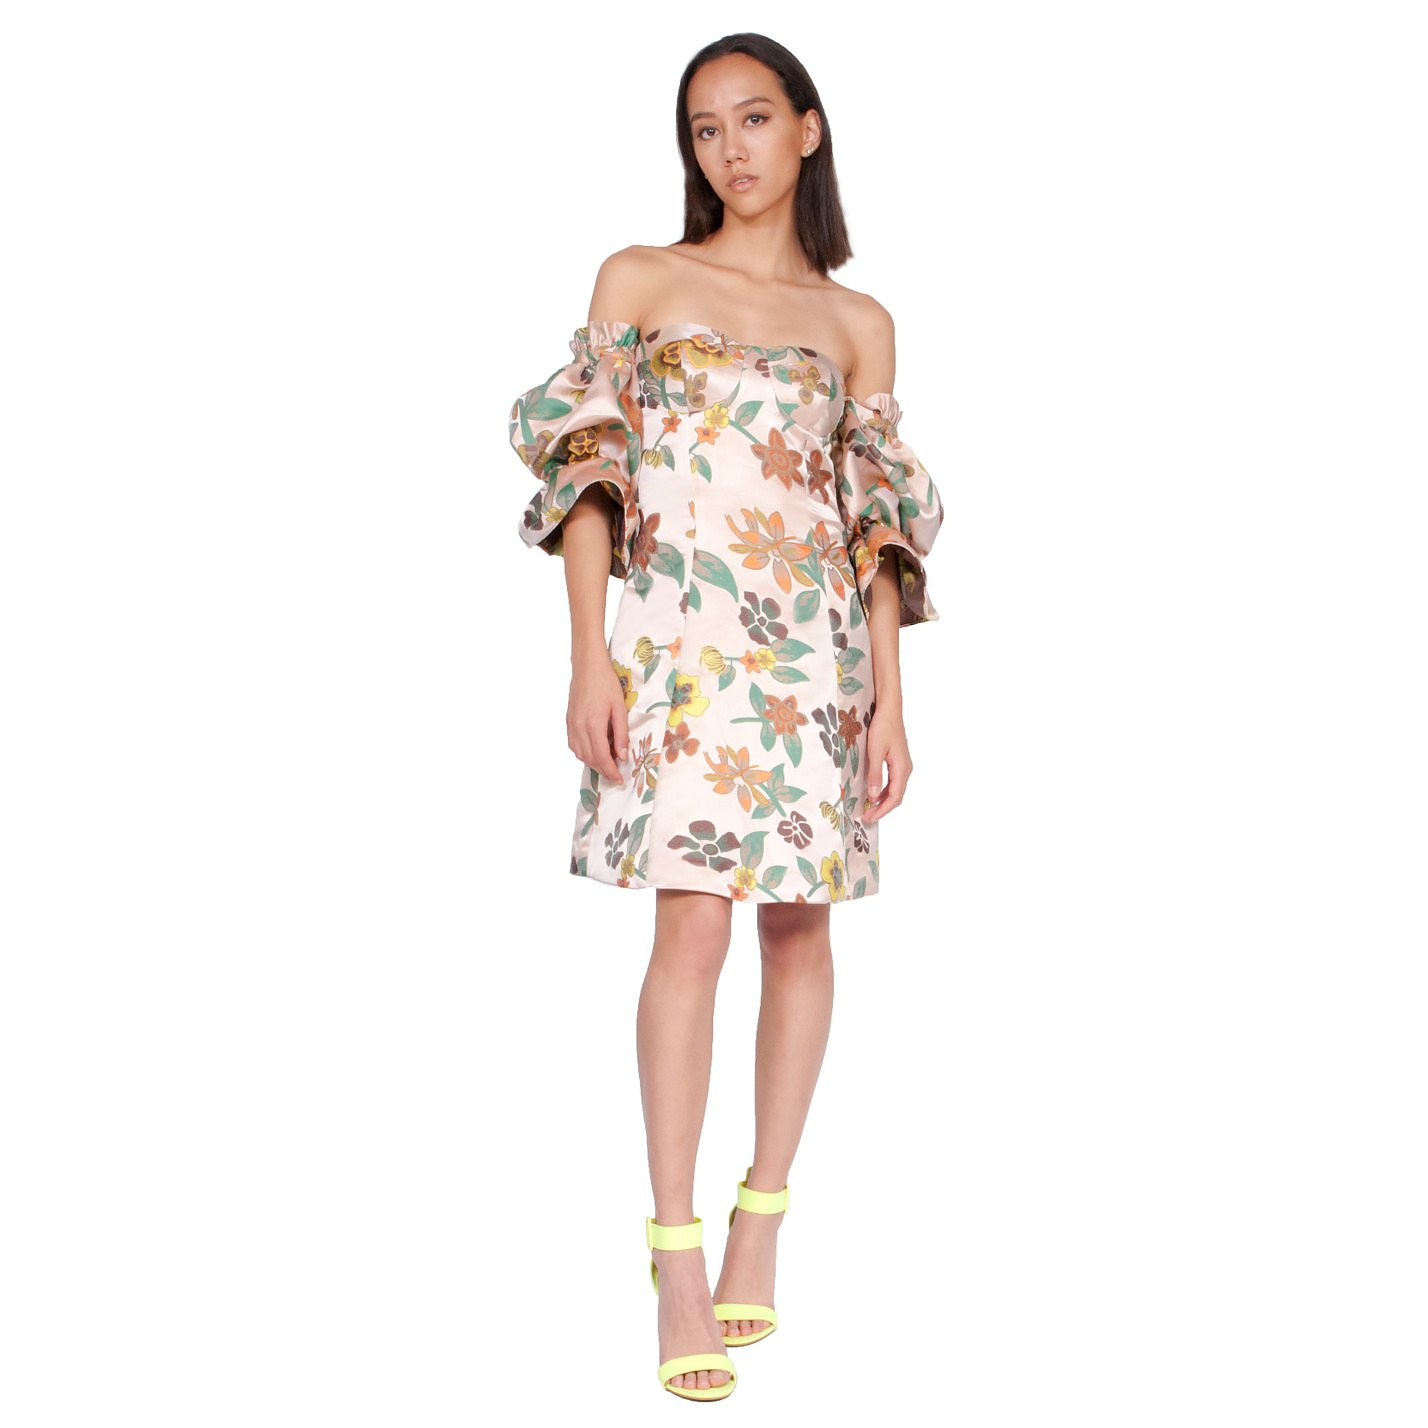 Syra J Bardot Floral Dress